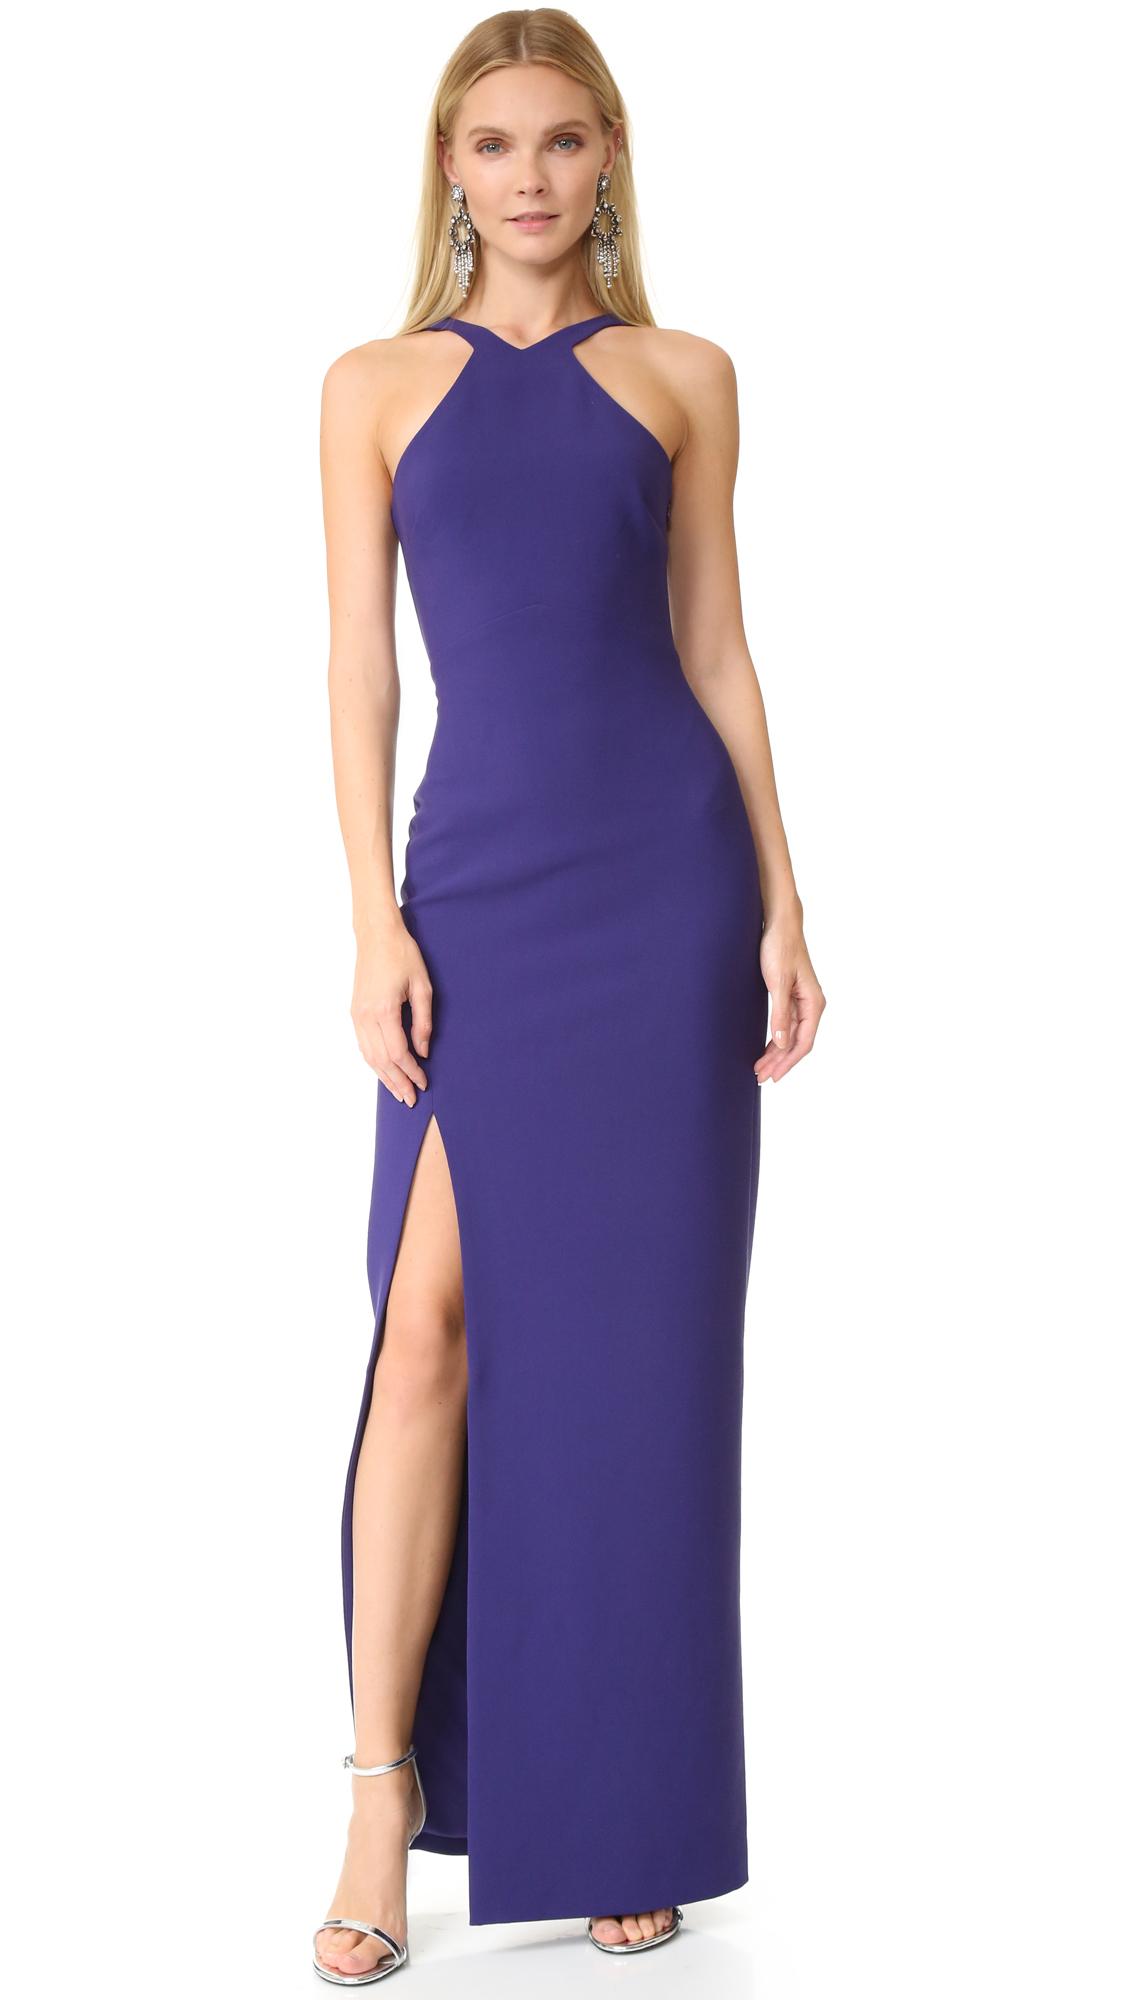 990b75729f4 Macys Womens Semi Formal Dresses - Data Dynamic AG